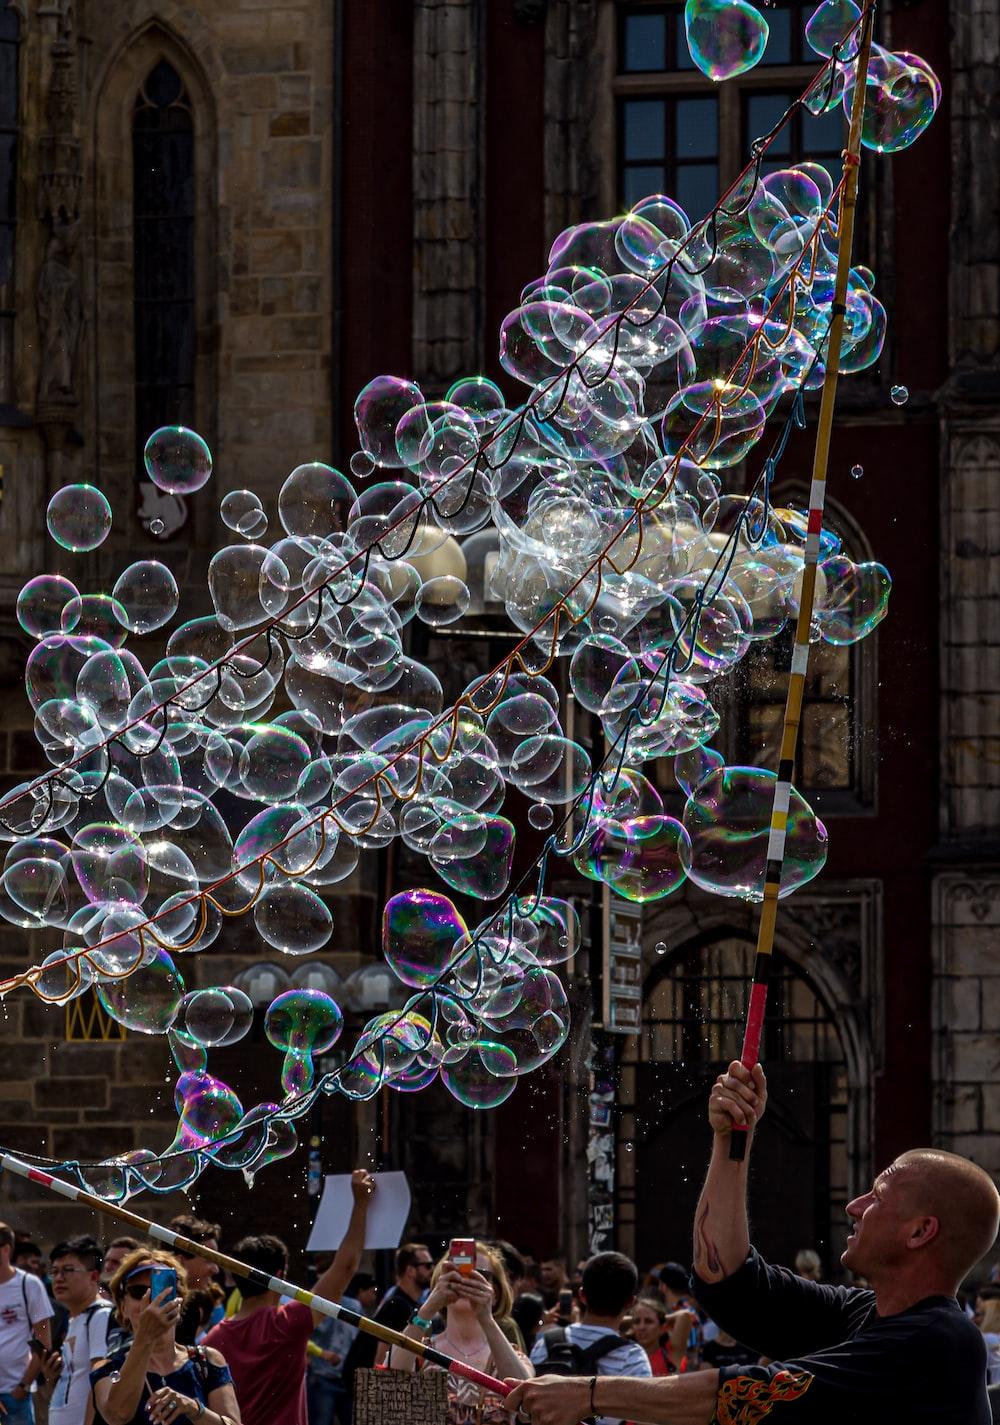 man showing bubble performance